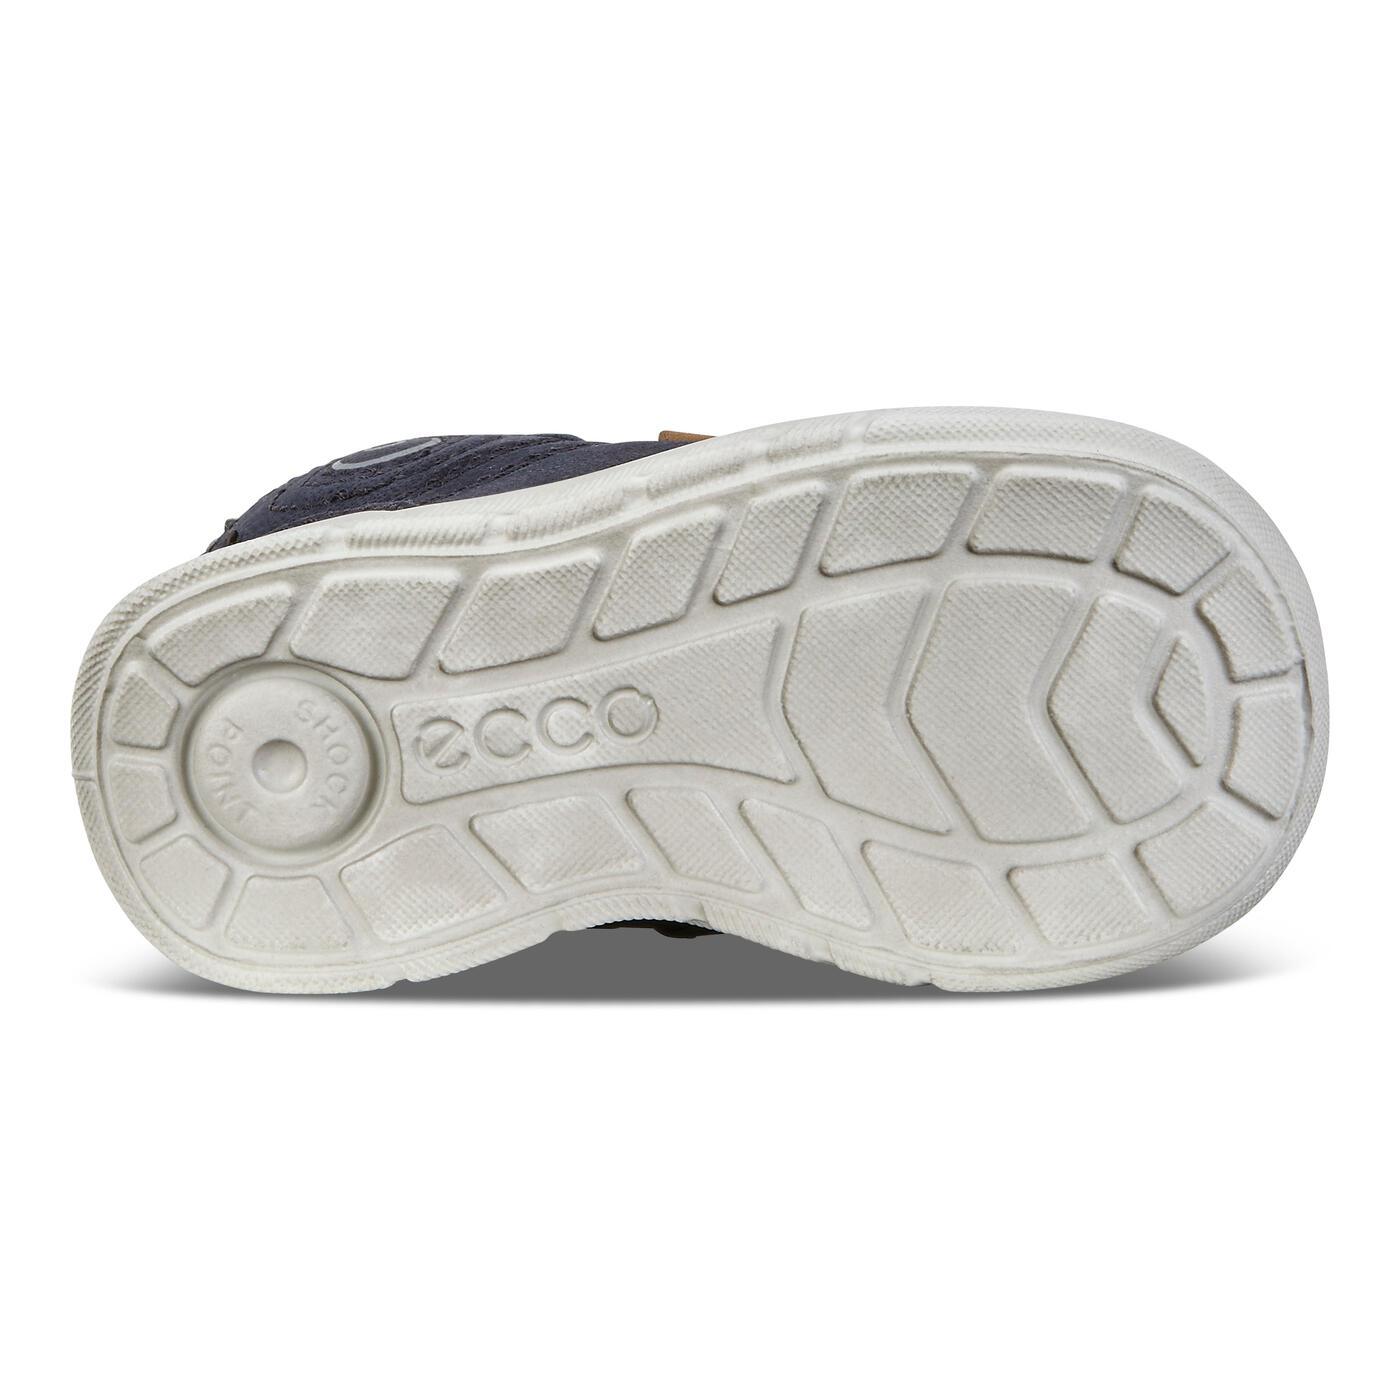 ECCO First GTX TODDLER BOOTS